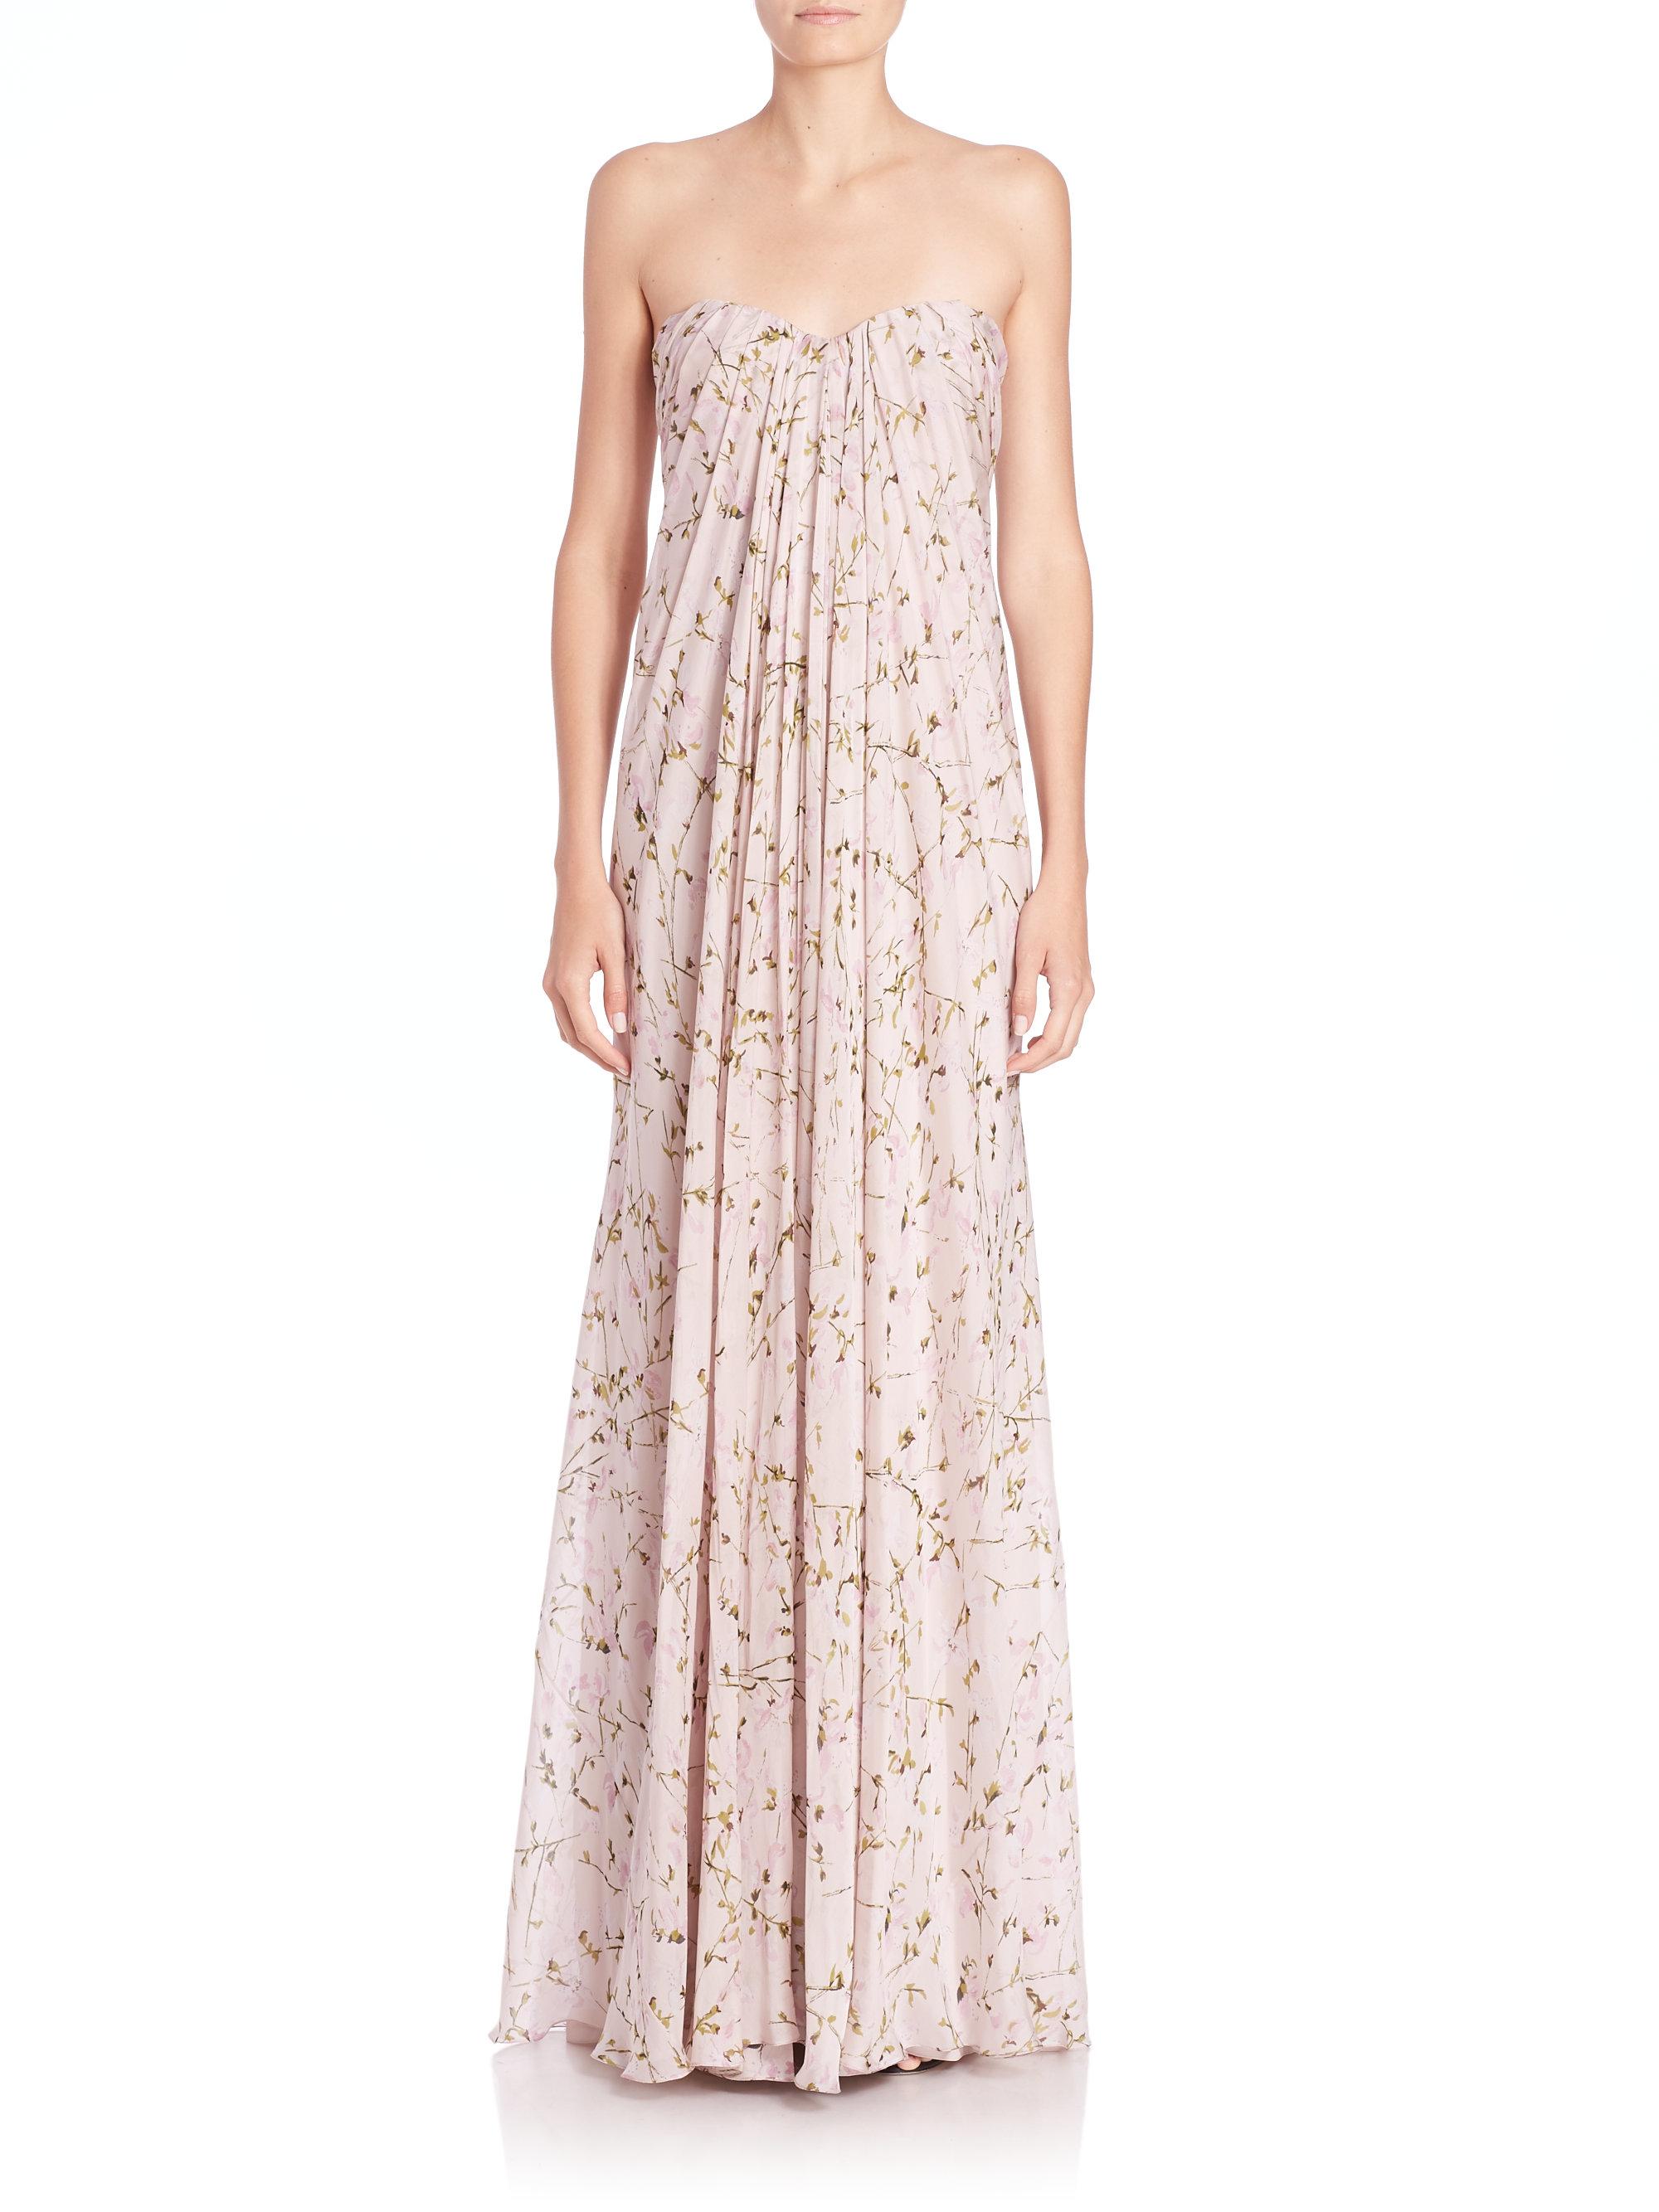 Alexander mcqueen Strapless Silk Chiffon Sweetpea Gown in Pink  Lyst